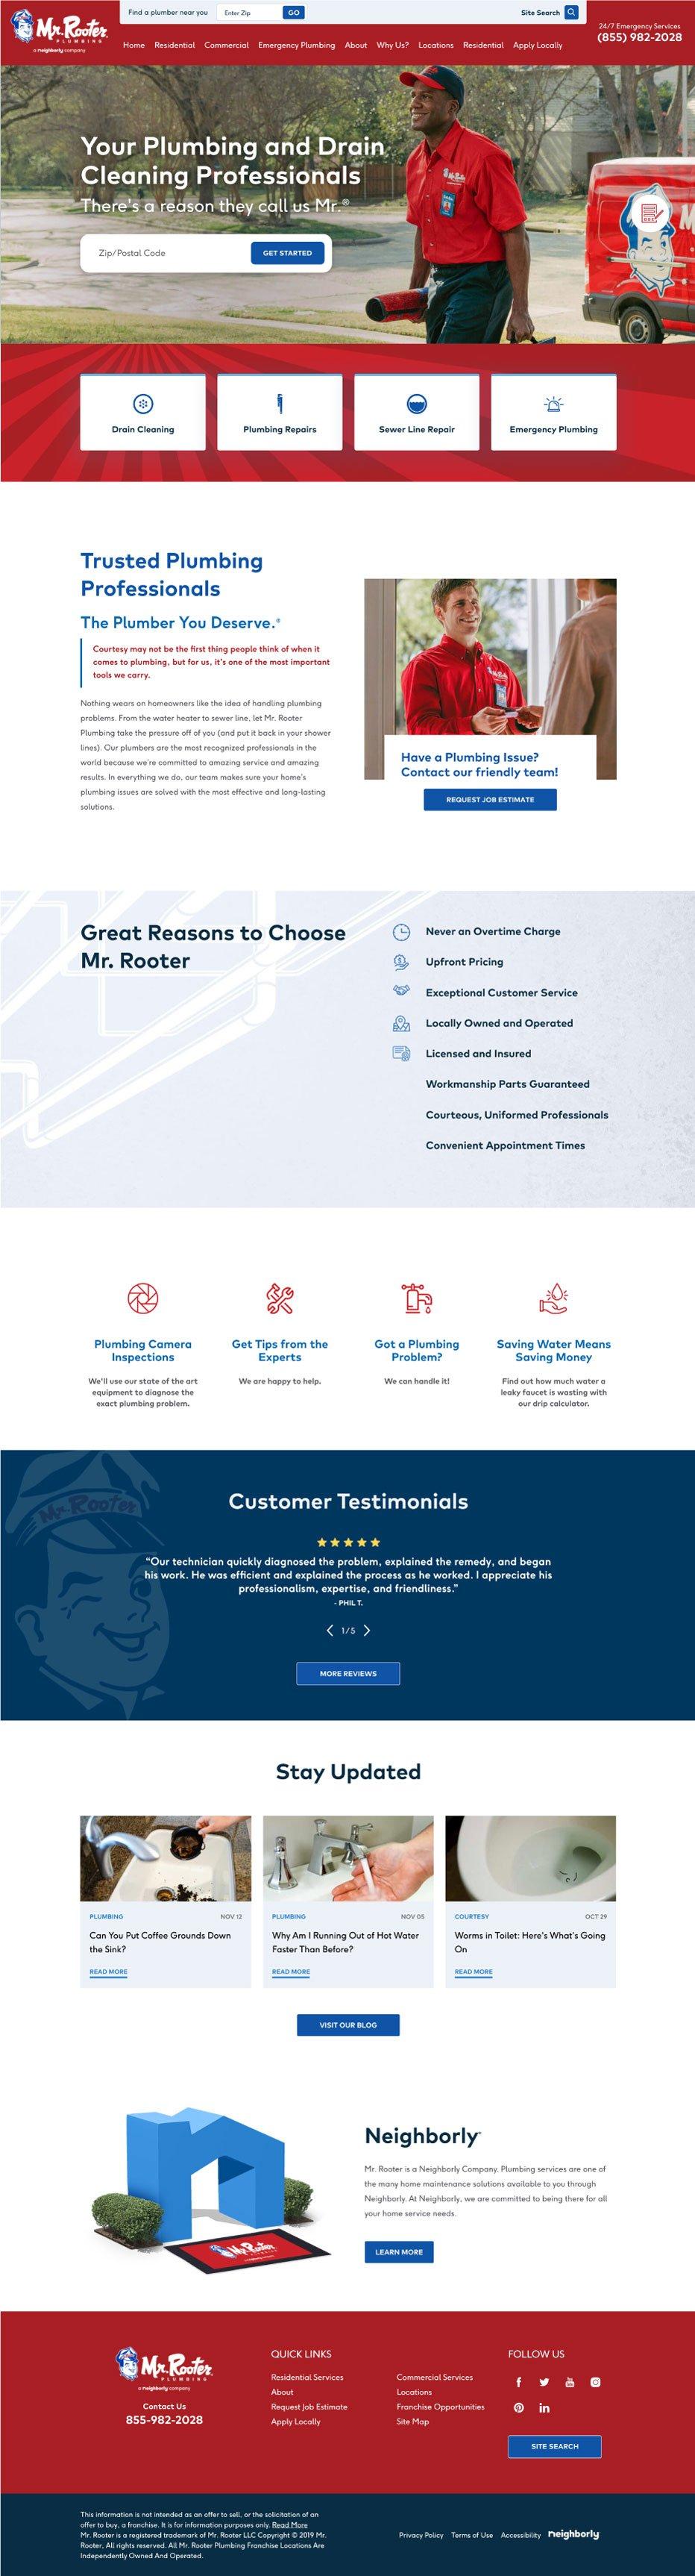 Mr Rooter Plumbing - Website Design Inspiration for Plumbers